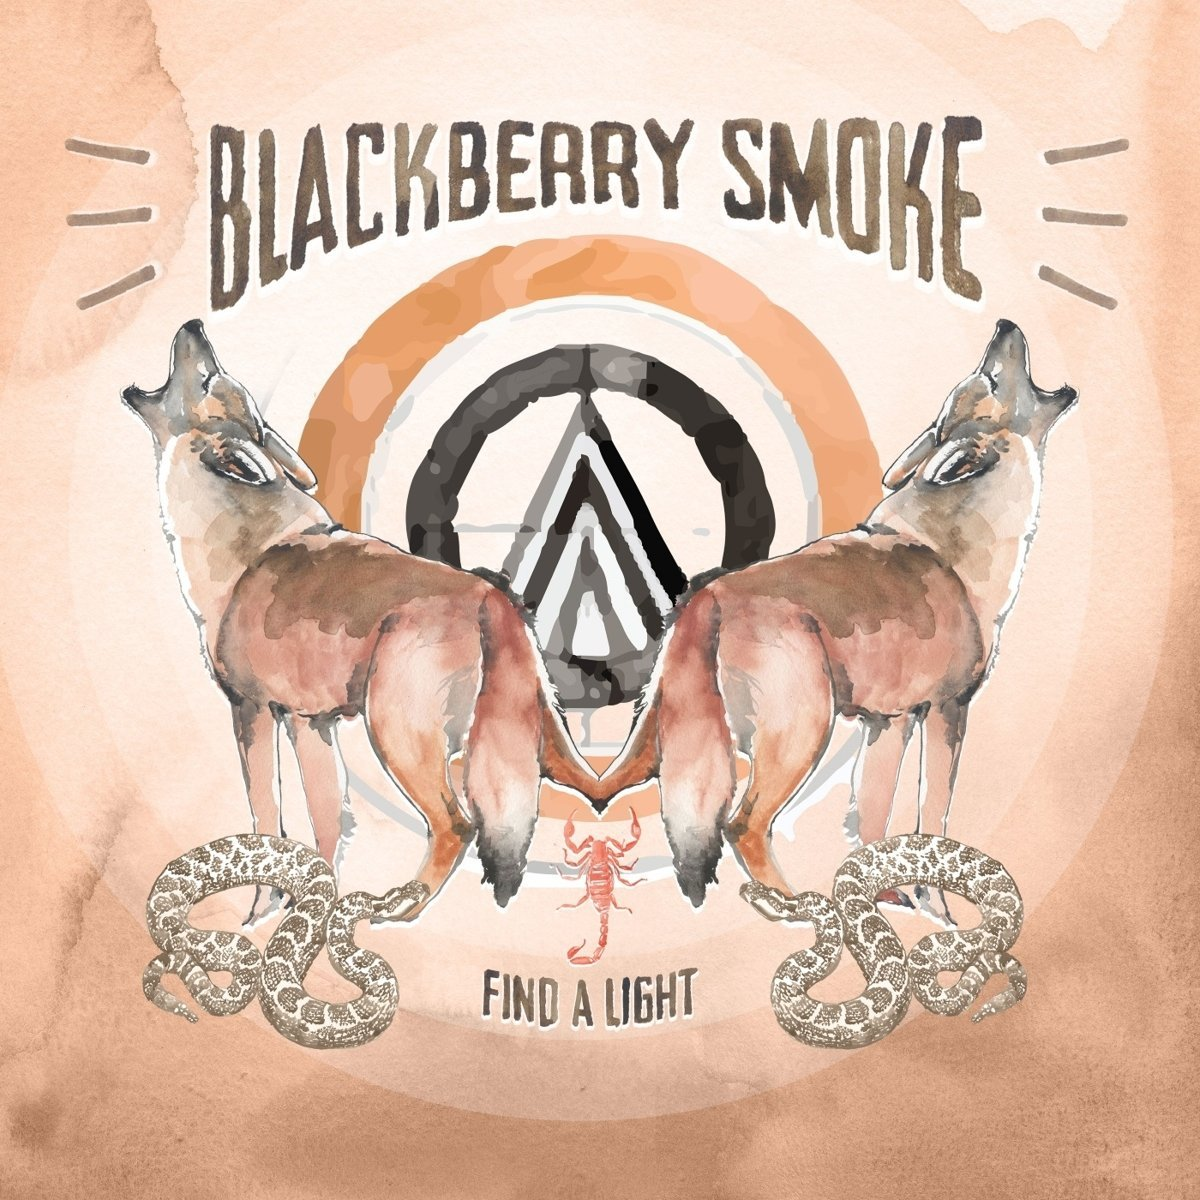 BLACKBERRY SMOKE - FIND A LIGHT (CD)